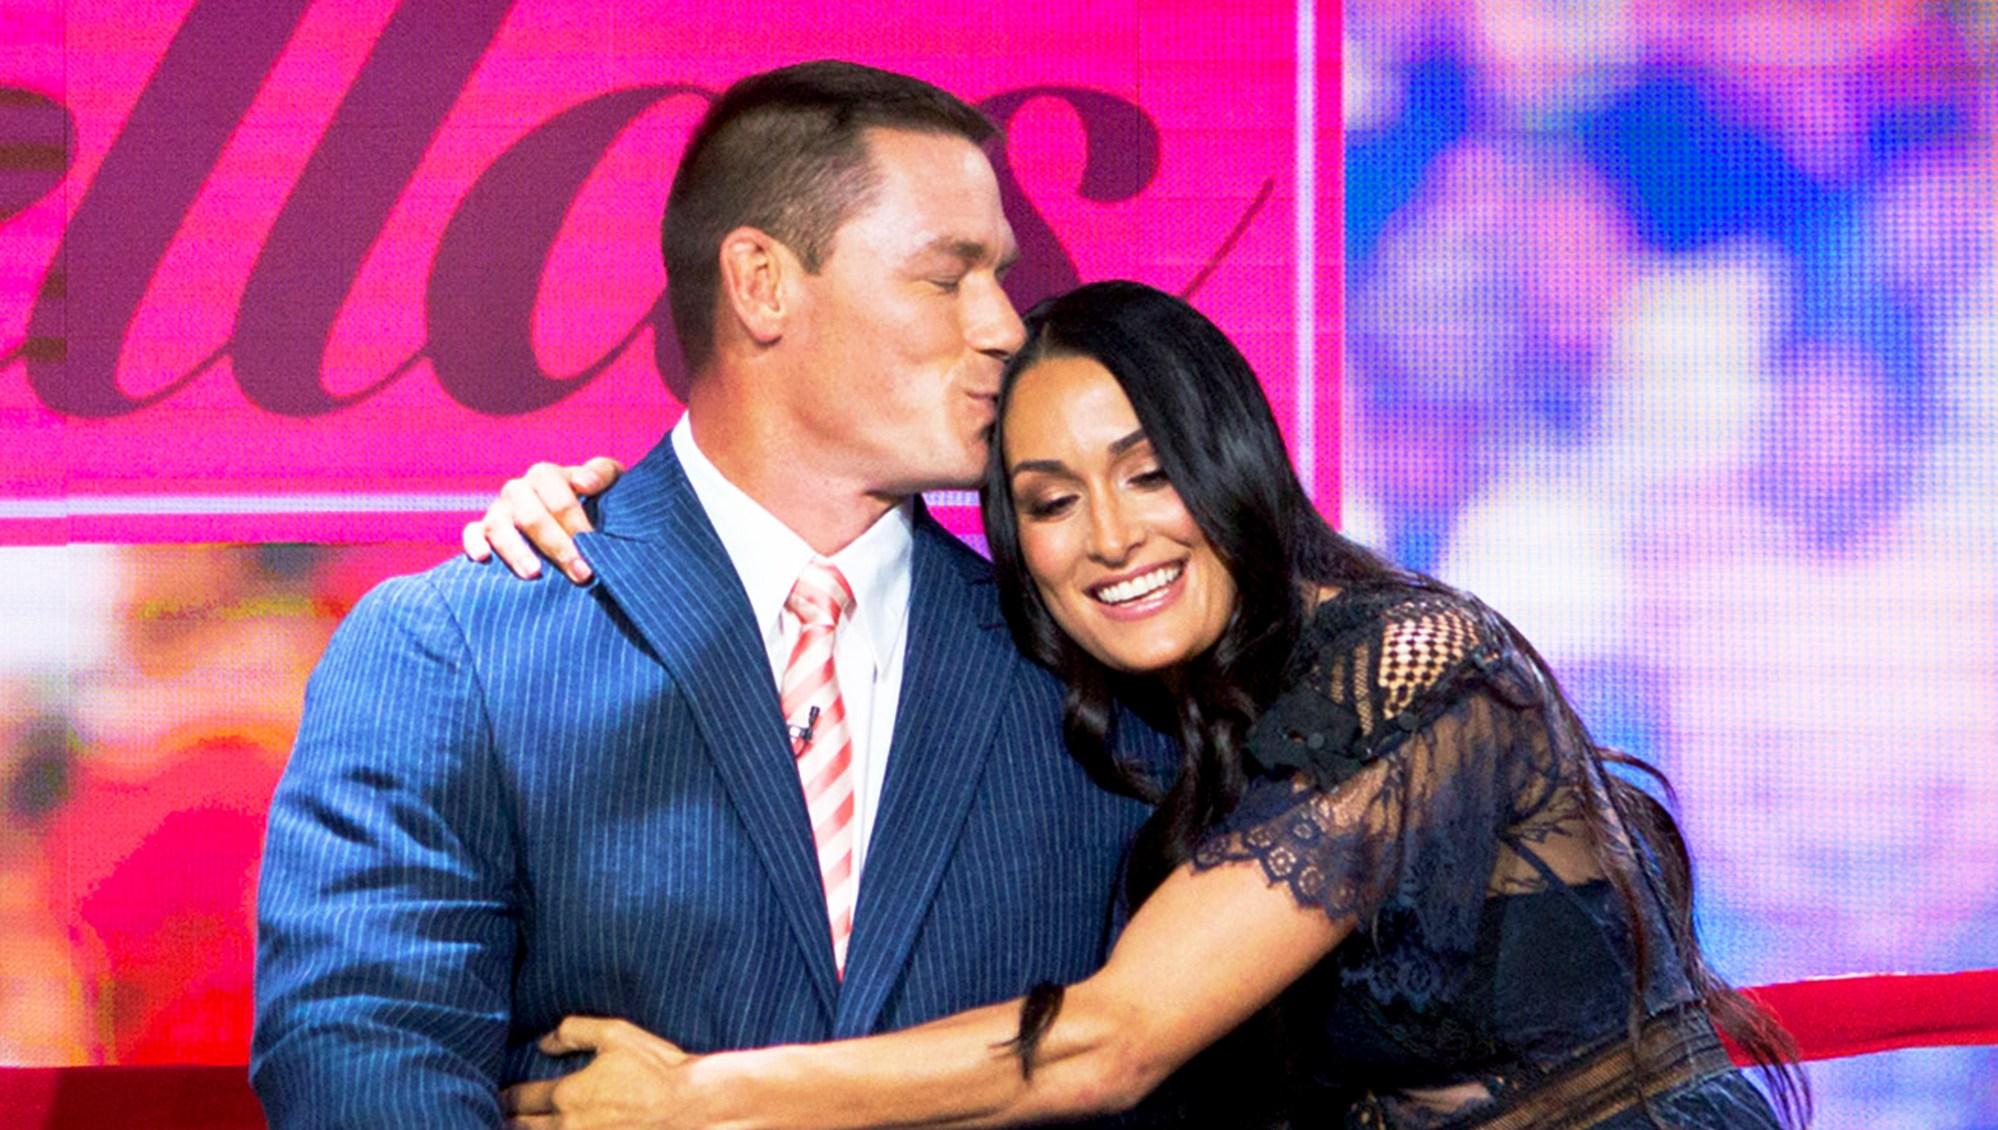 John Cena and Nikki Bella on 'Today' show